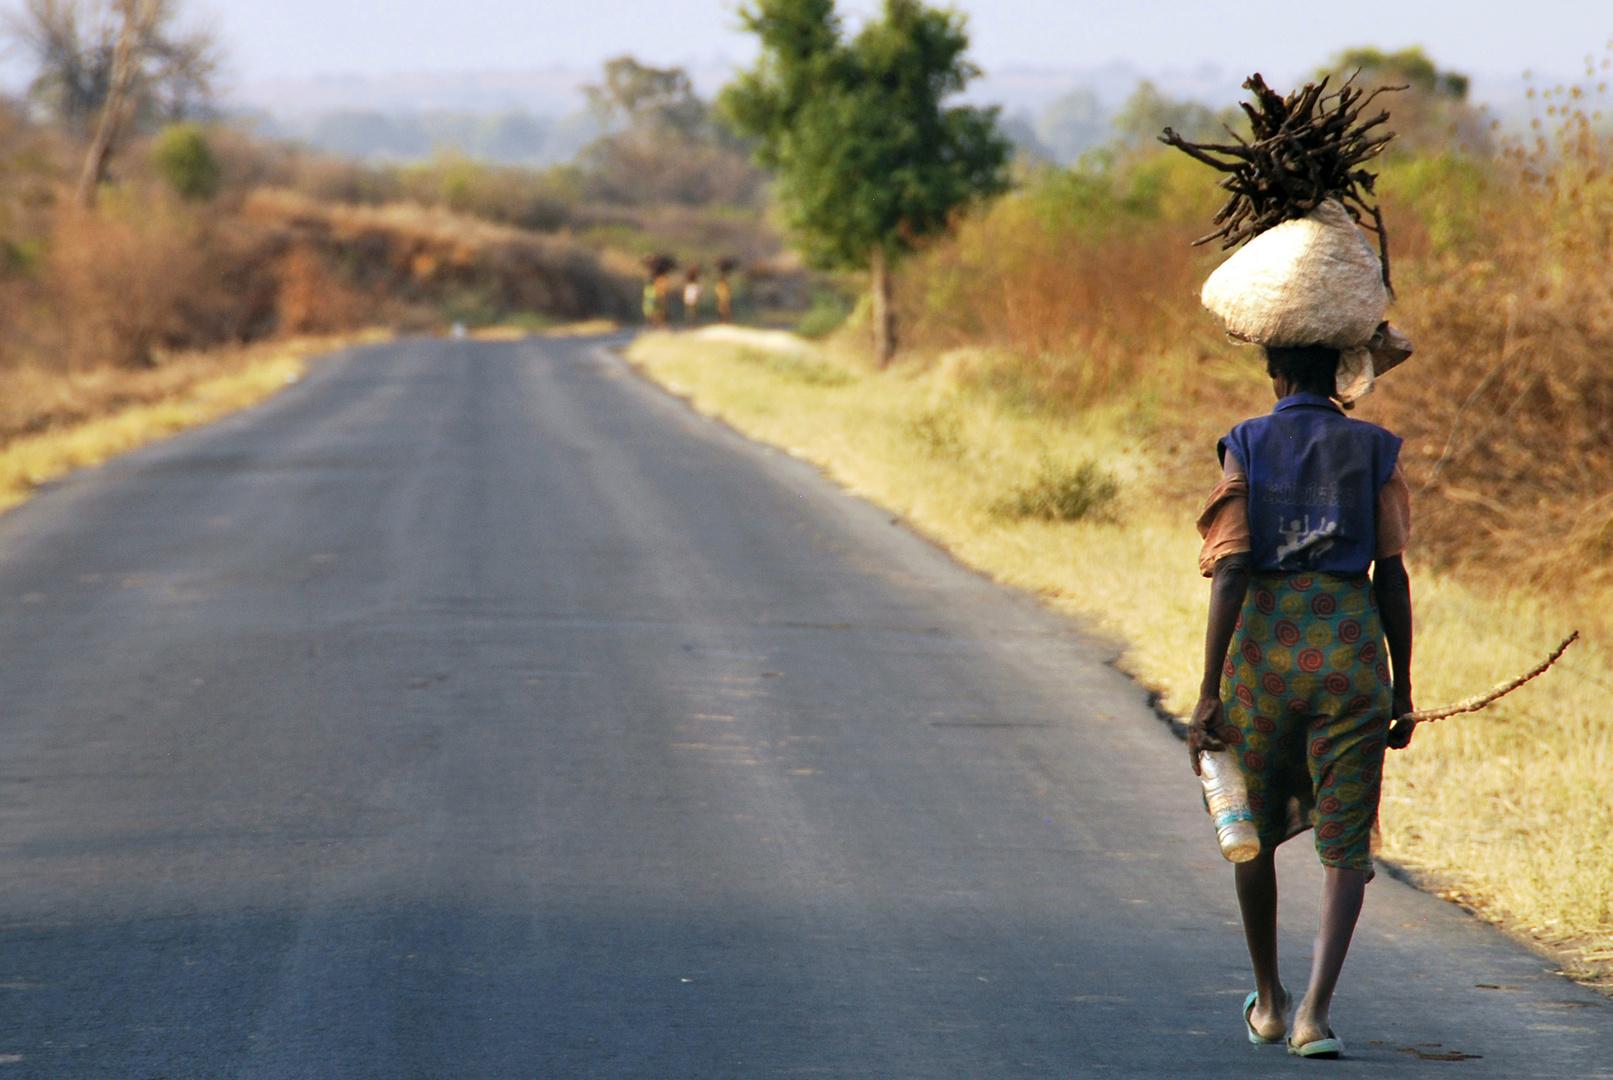 Madagascar on the road  - 2 -